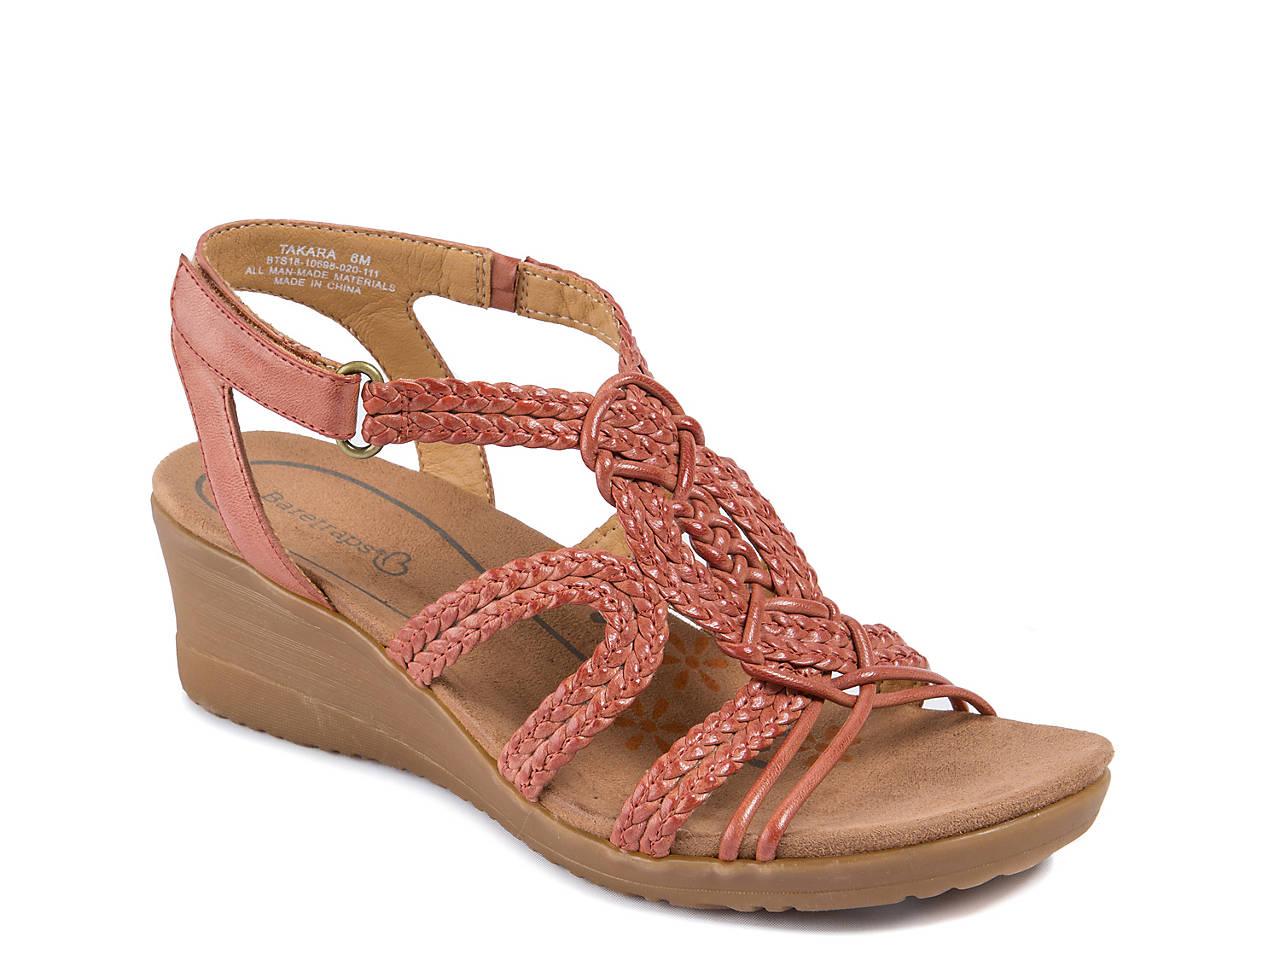 f23cbe3fc5 Bare Traps Takara Wedge Sandal Women's Shoes   DSW